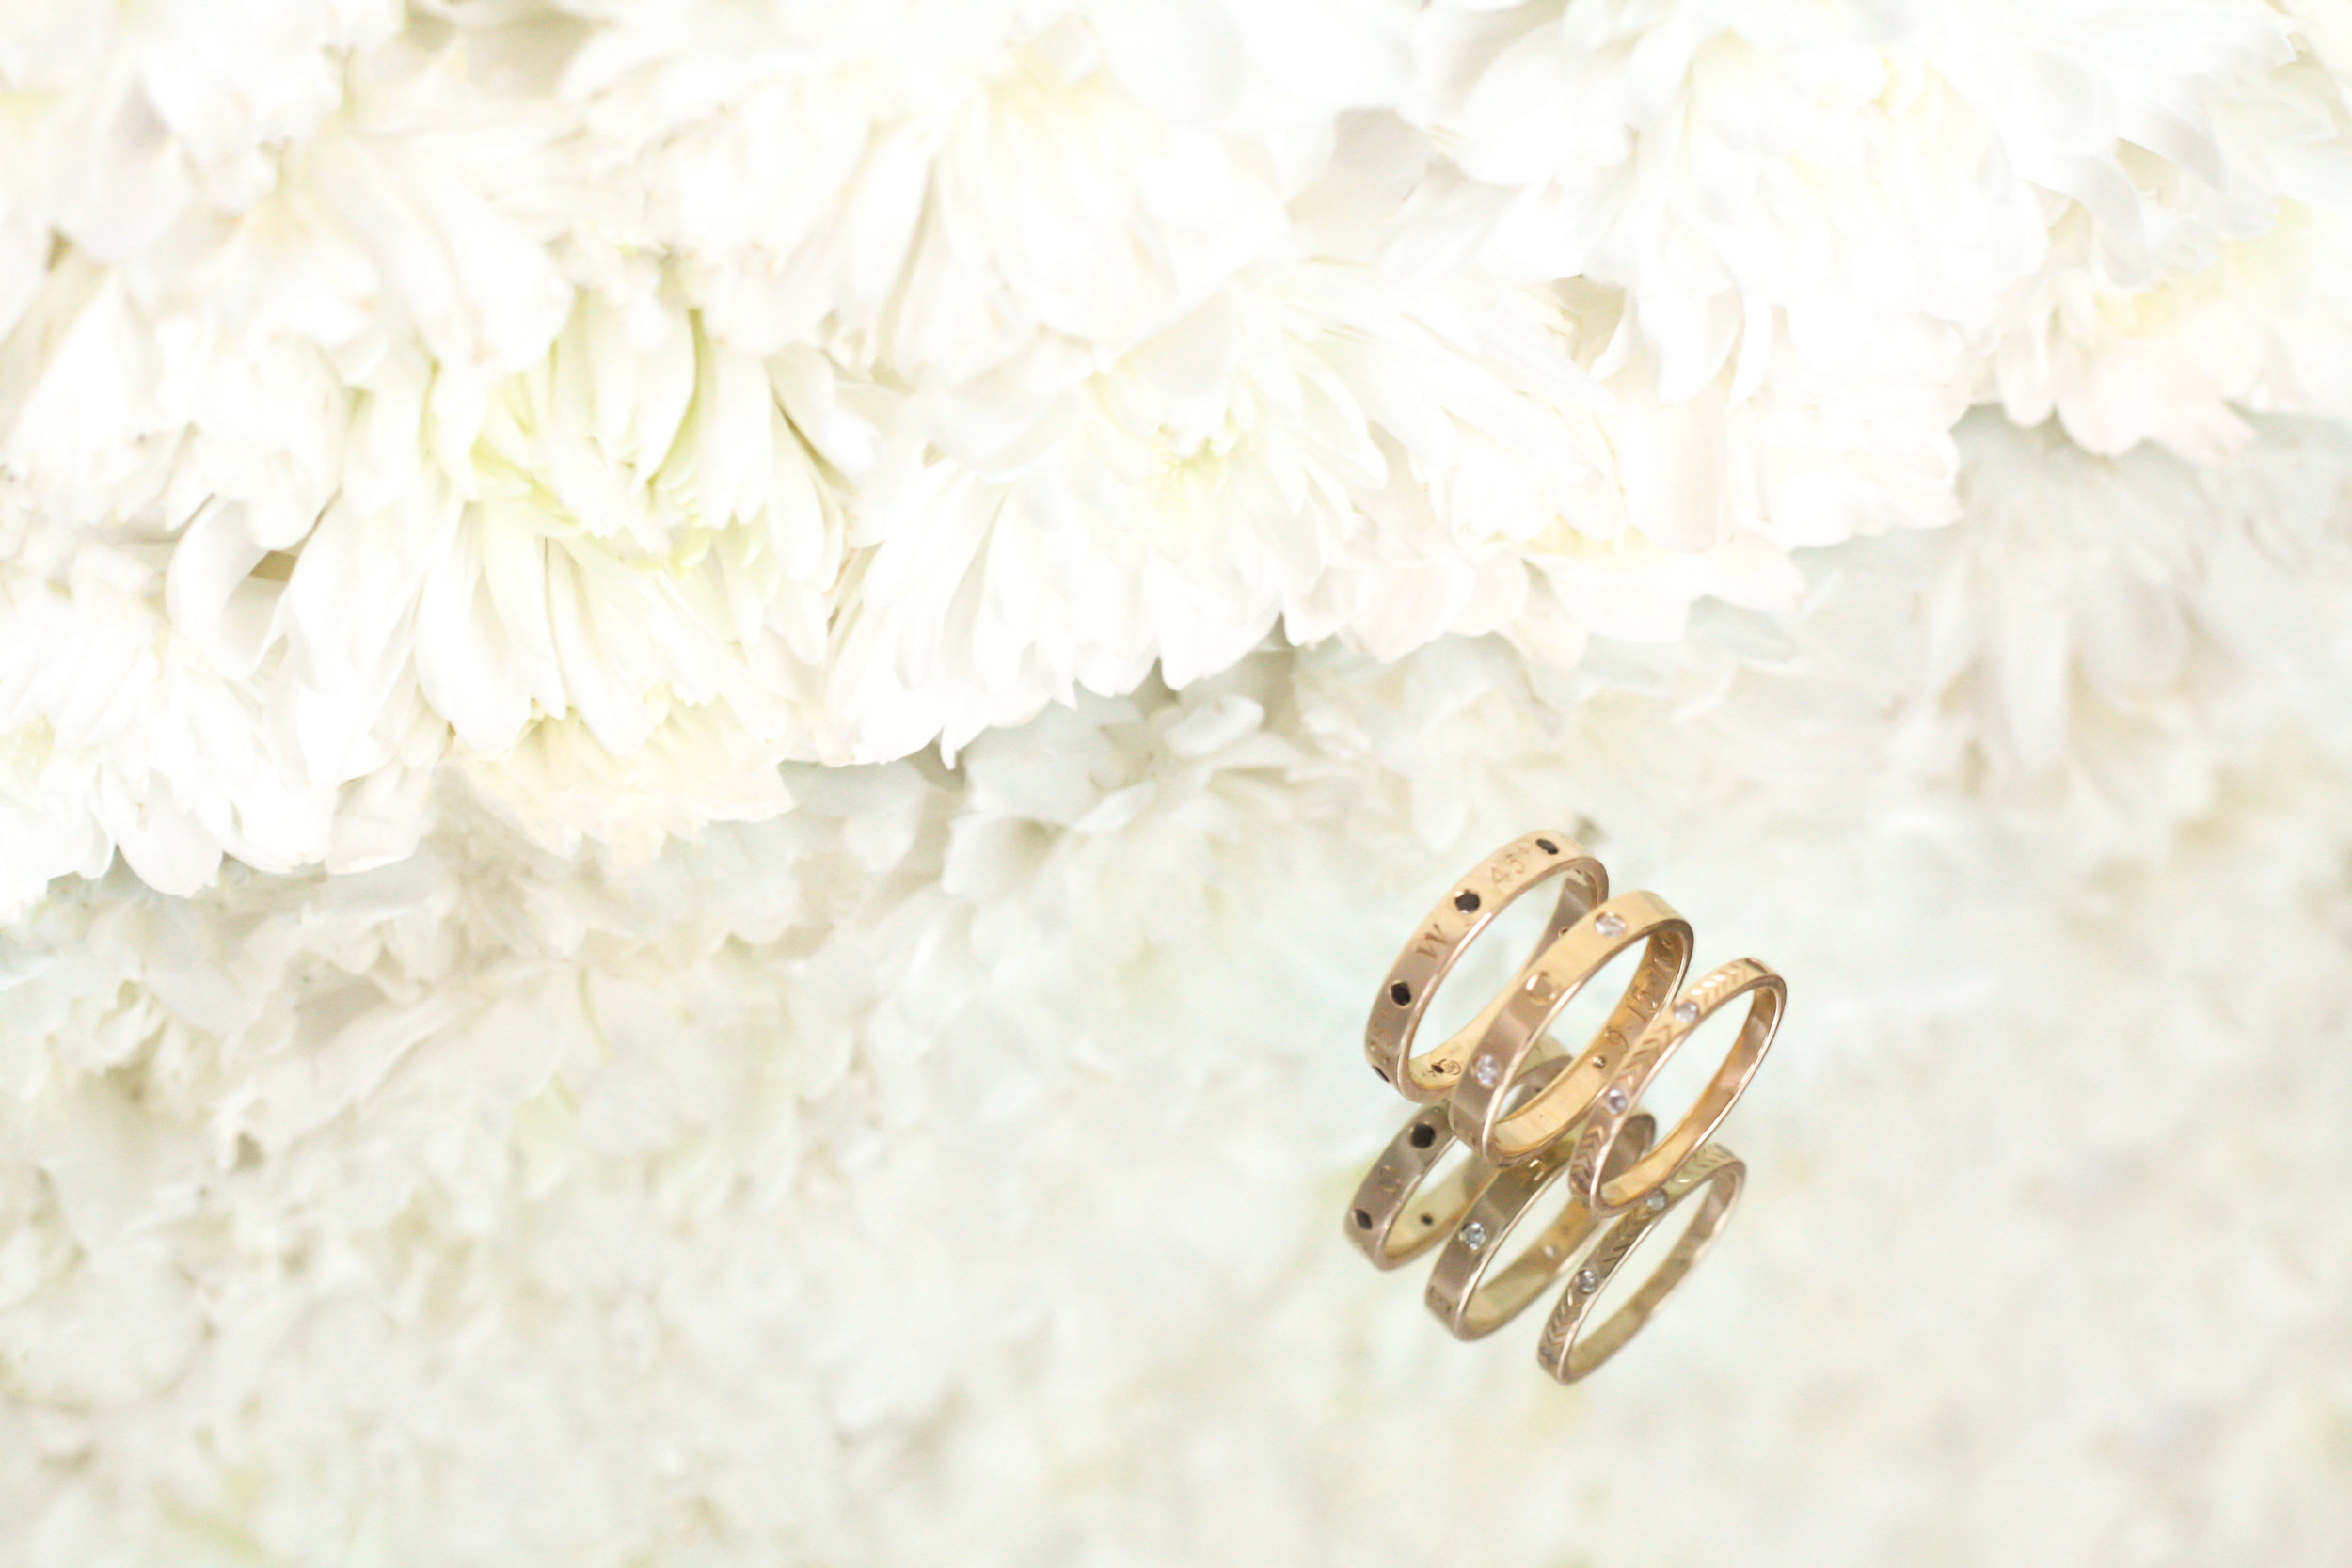 custom-rings-by-kerry-gilligan-coordinates-ring-staker-ring-and-namesake-ring.jpg